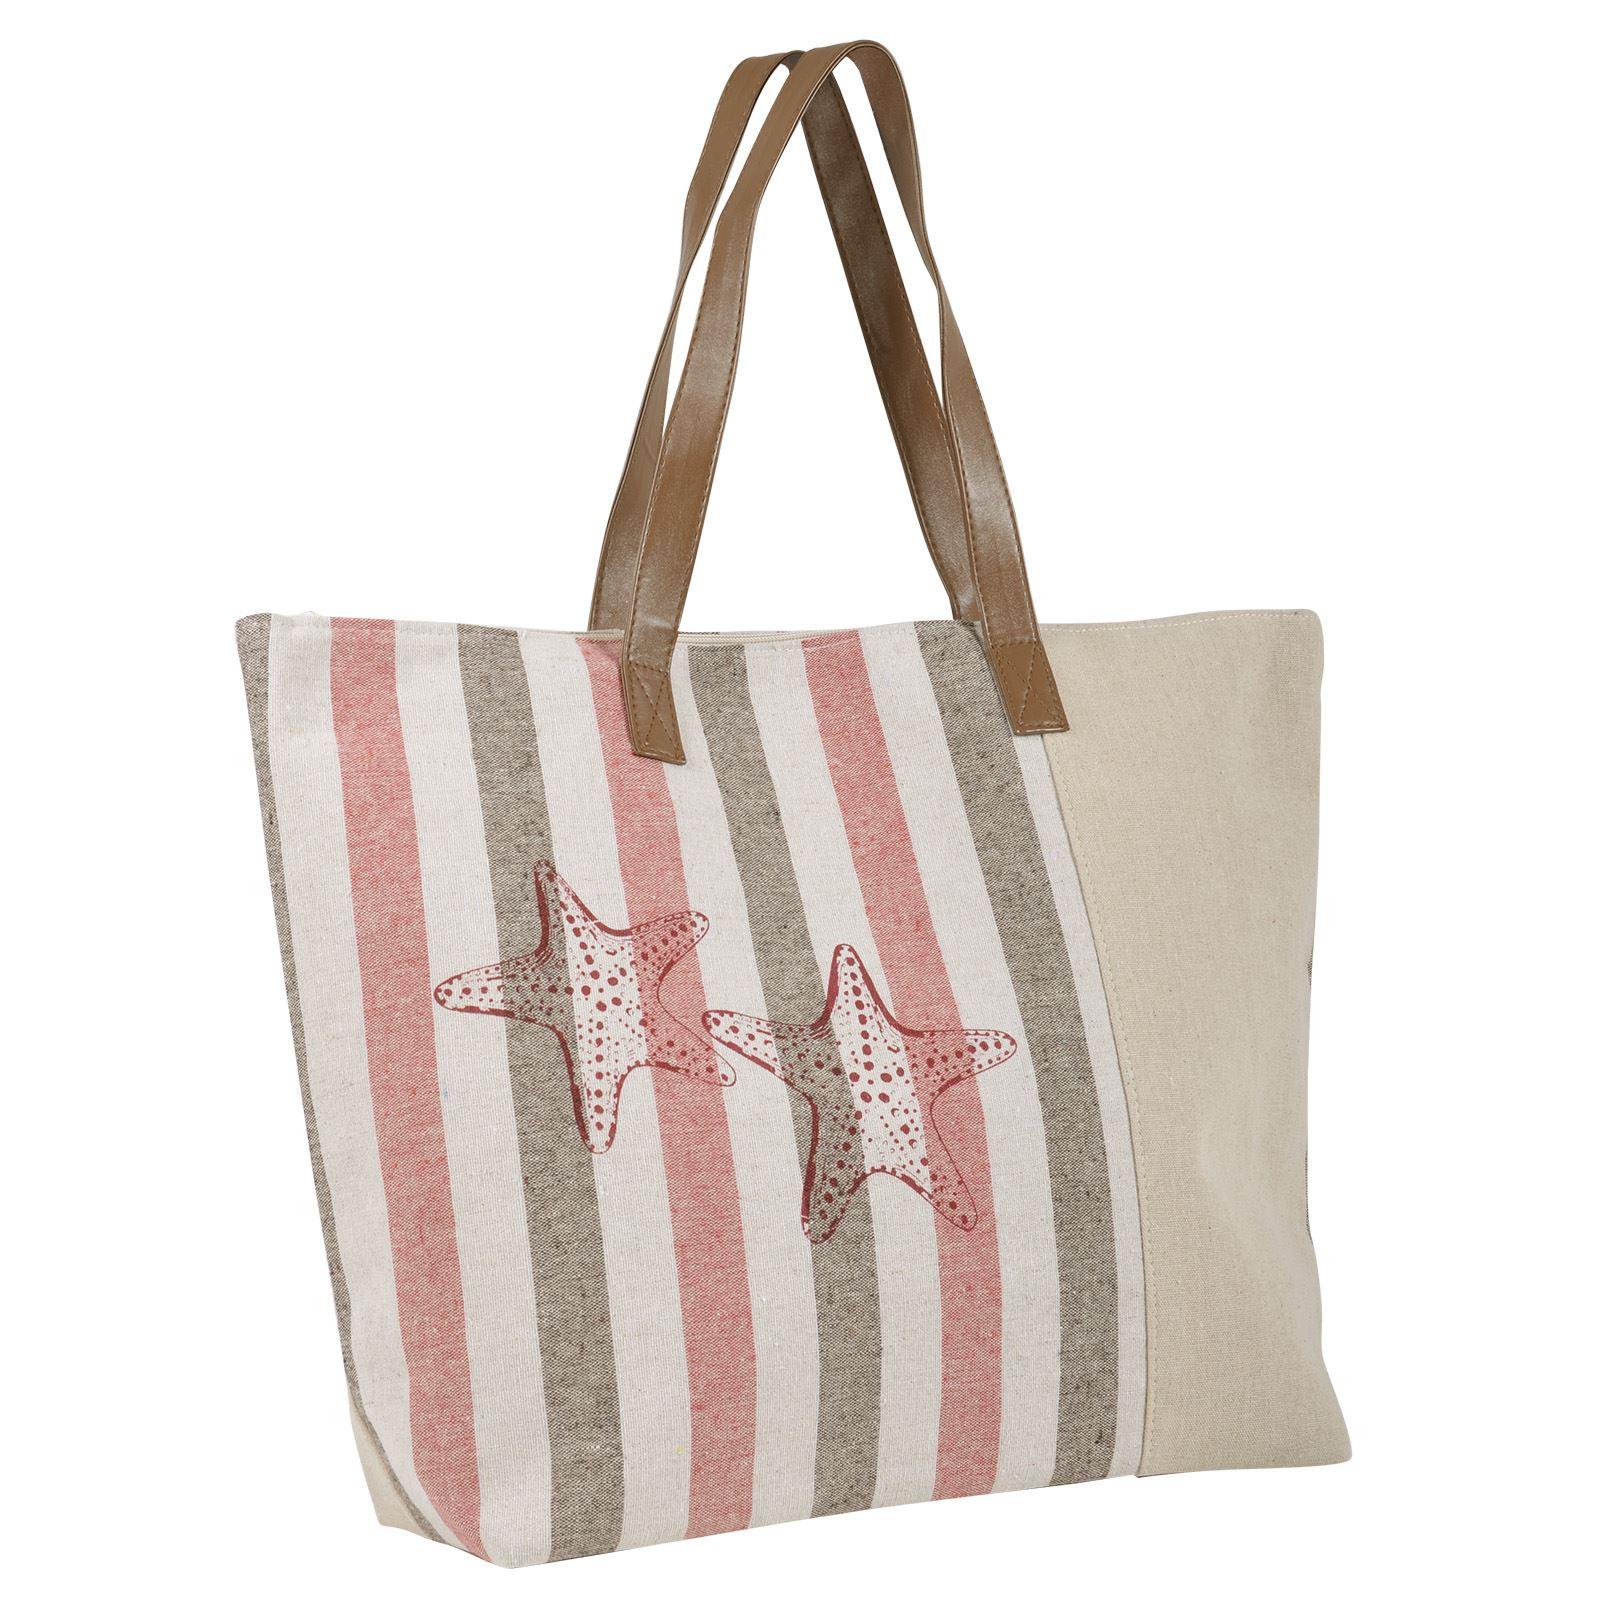 d2c7409fd2 Ladies Canvas Beach Shoulder Bag Handbag Shopping Tote Holiday ...